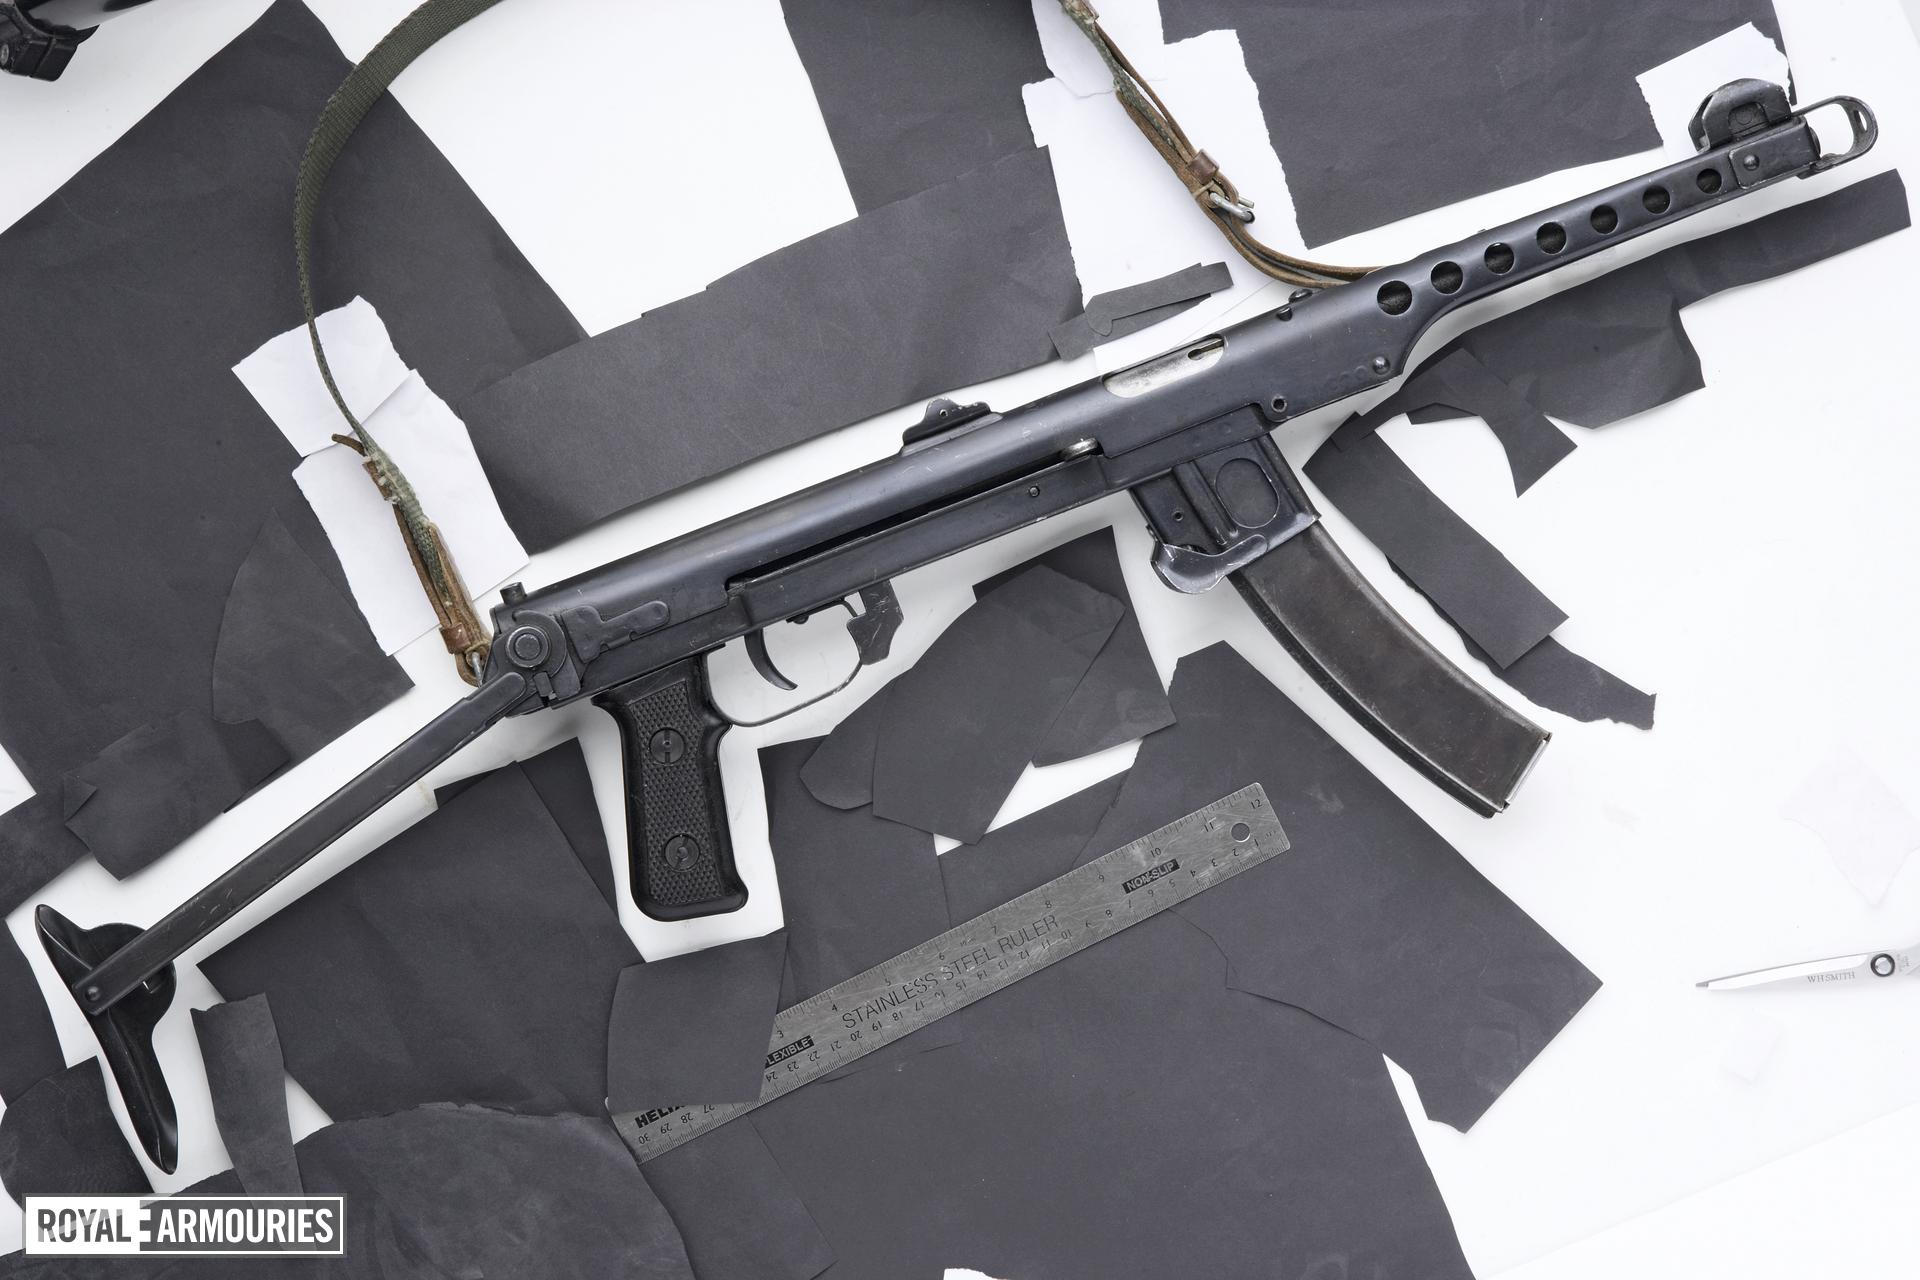 Centrefire self-loading pistol - Sudayev PPS43